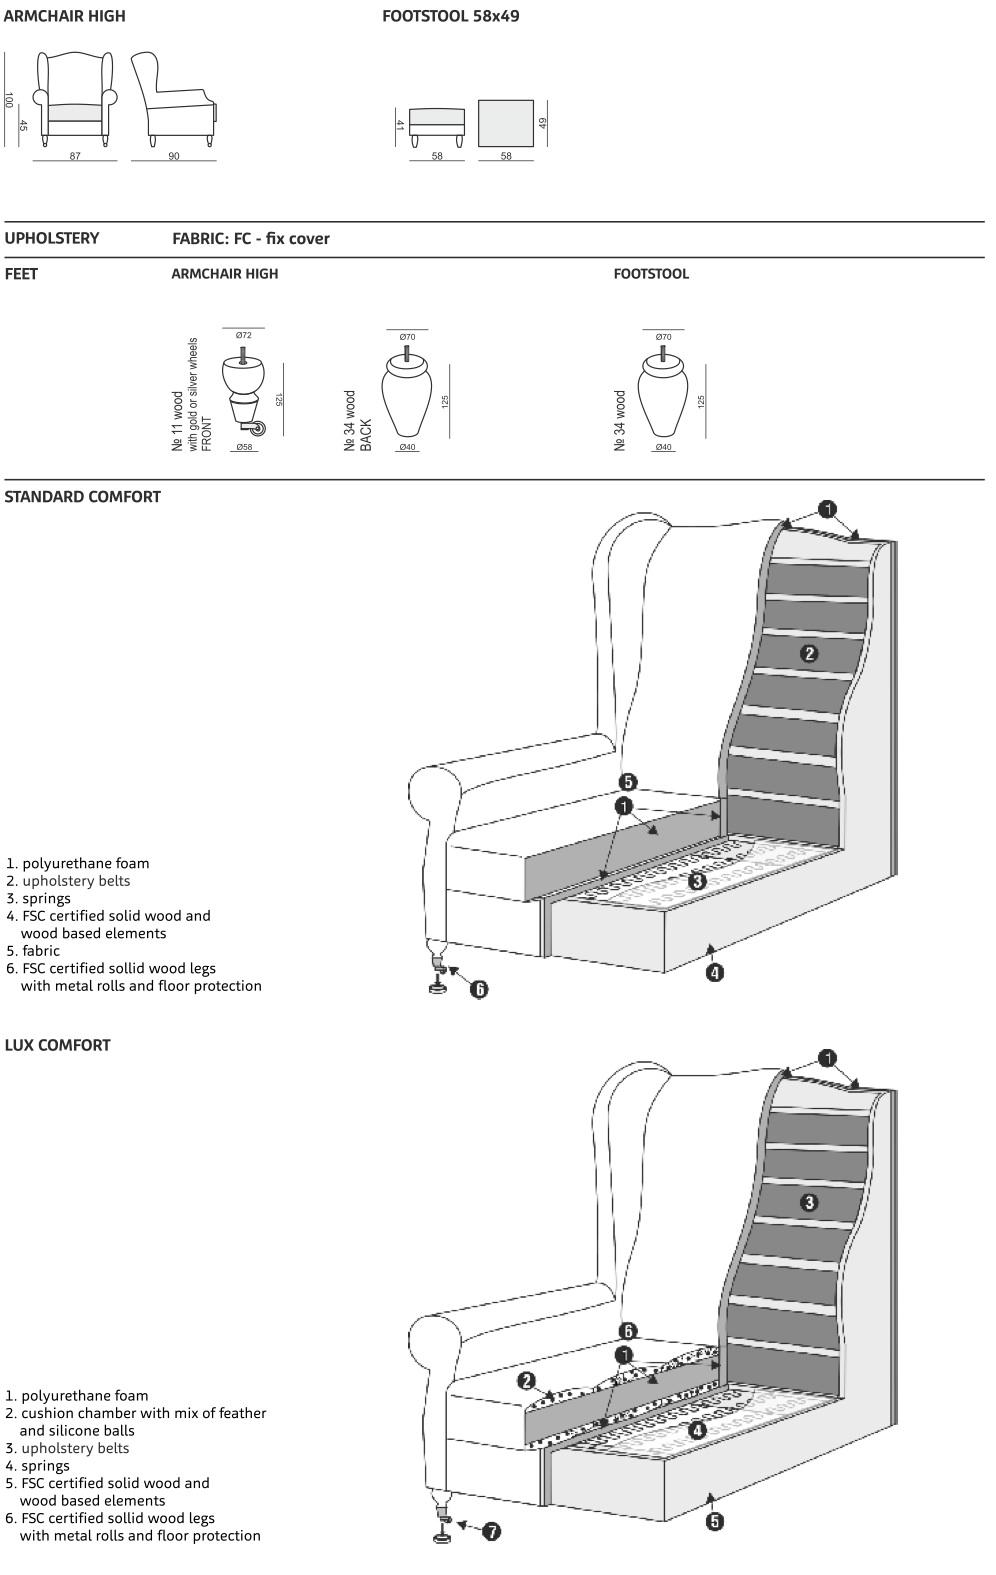 sits-humphrey-picto